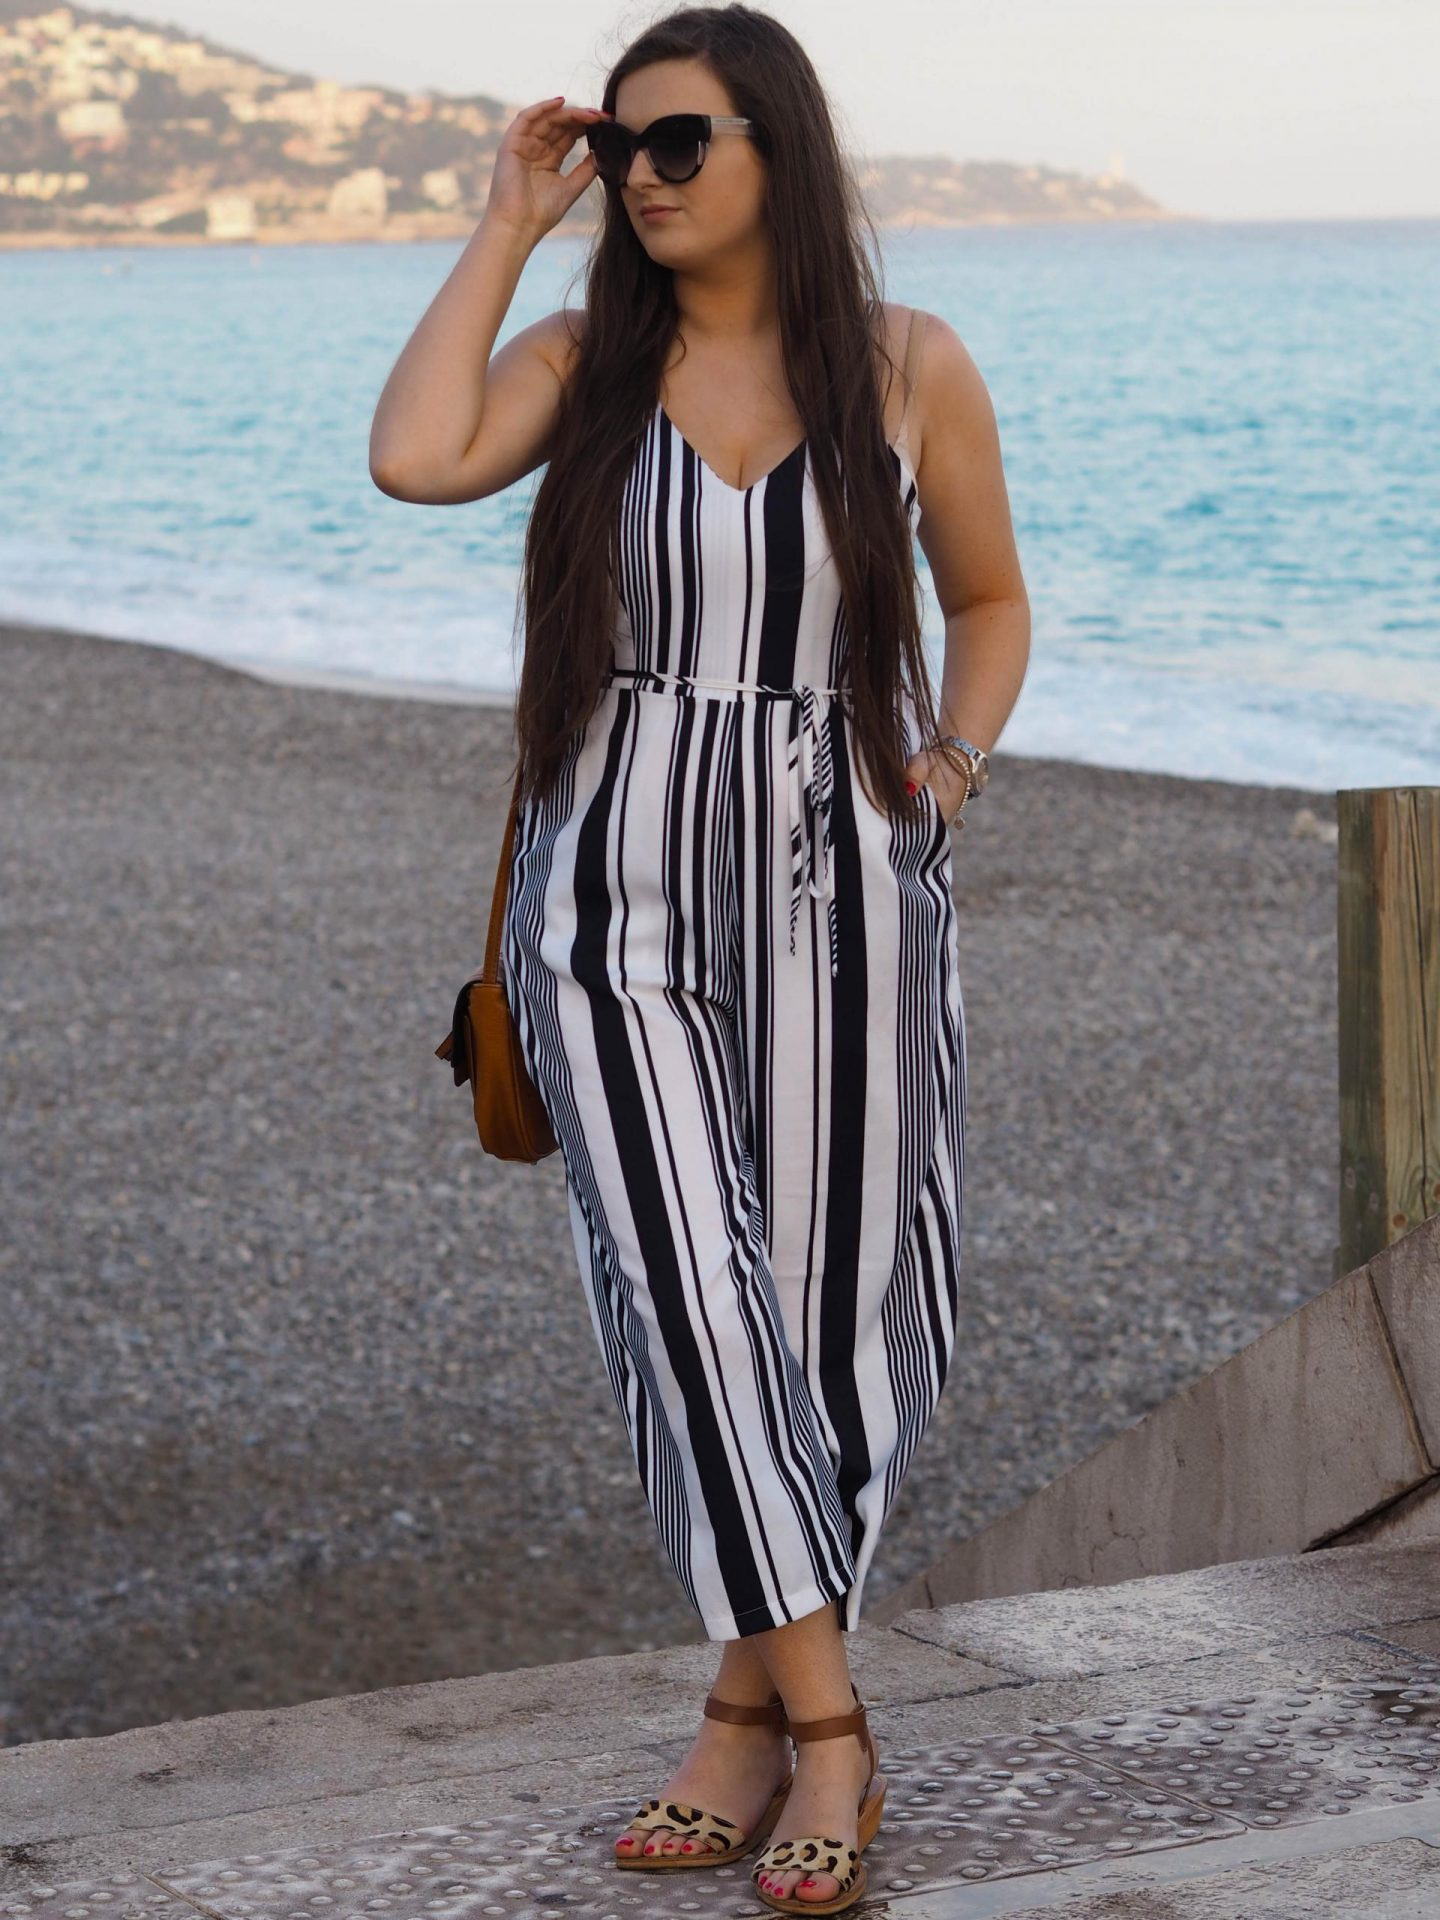 AX Striped Jumpsuit - Rachel Nicole UK Fashion Blogger 3